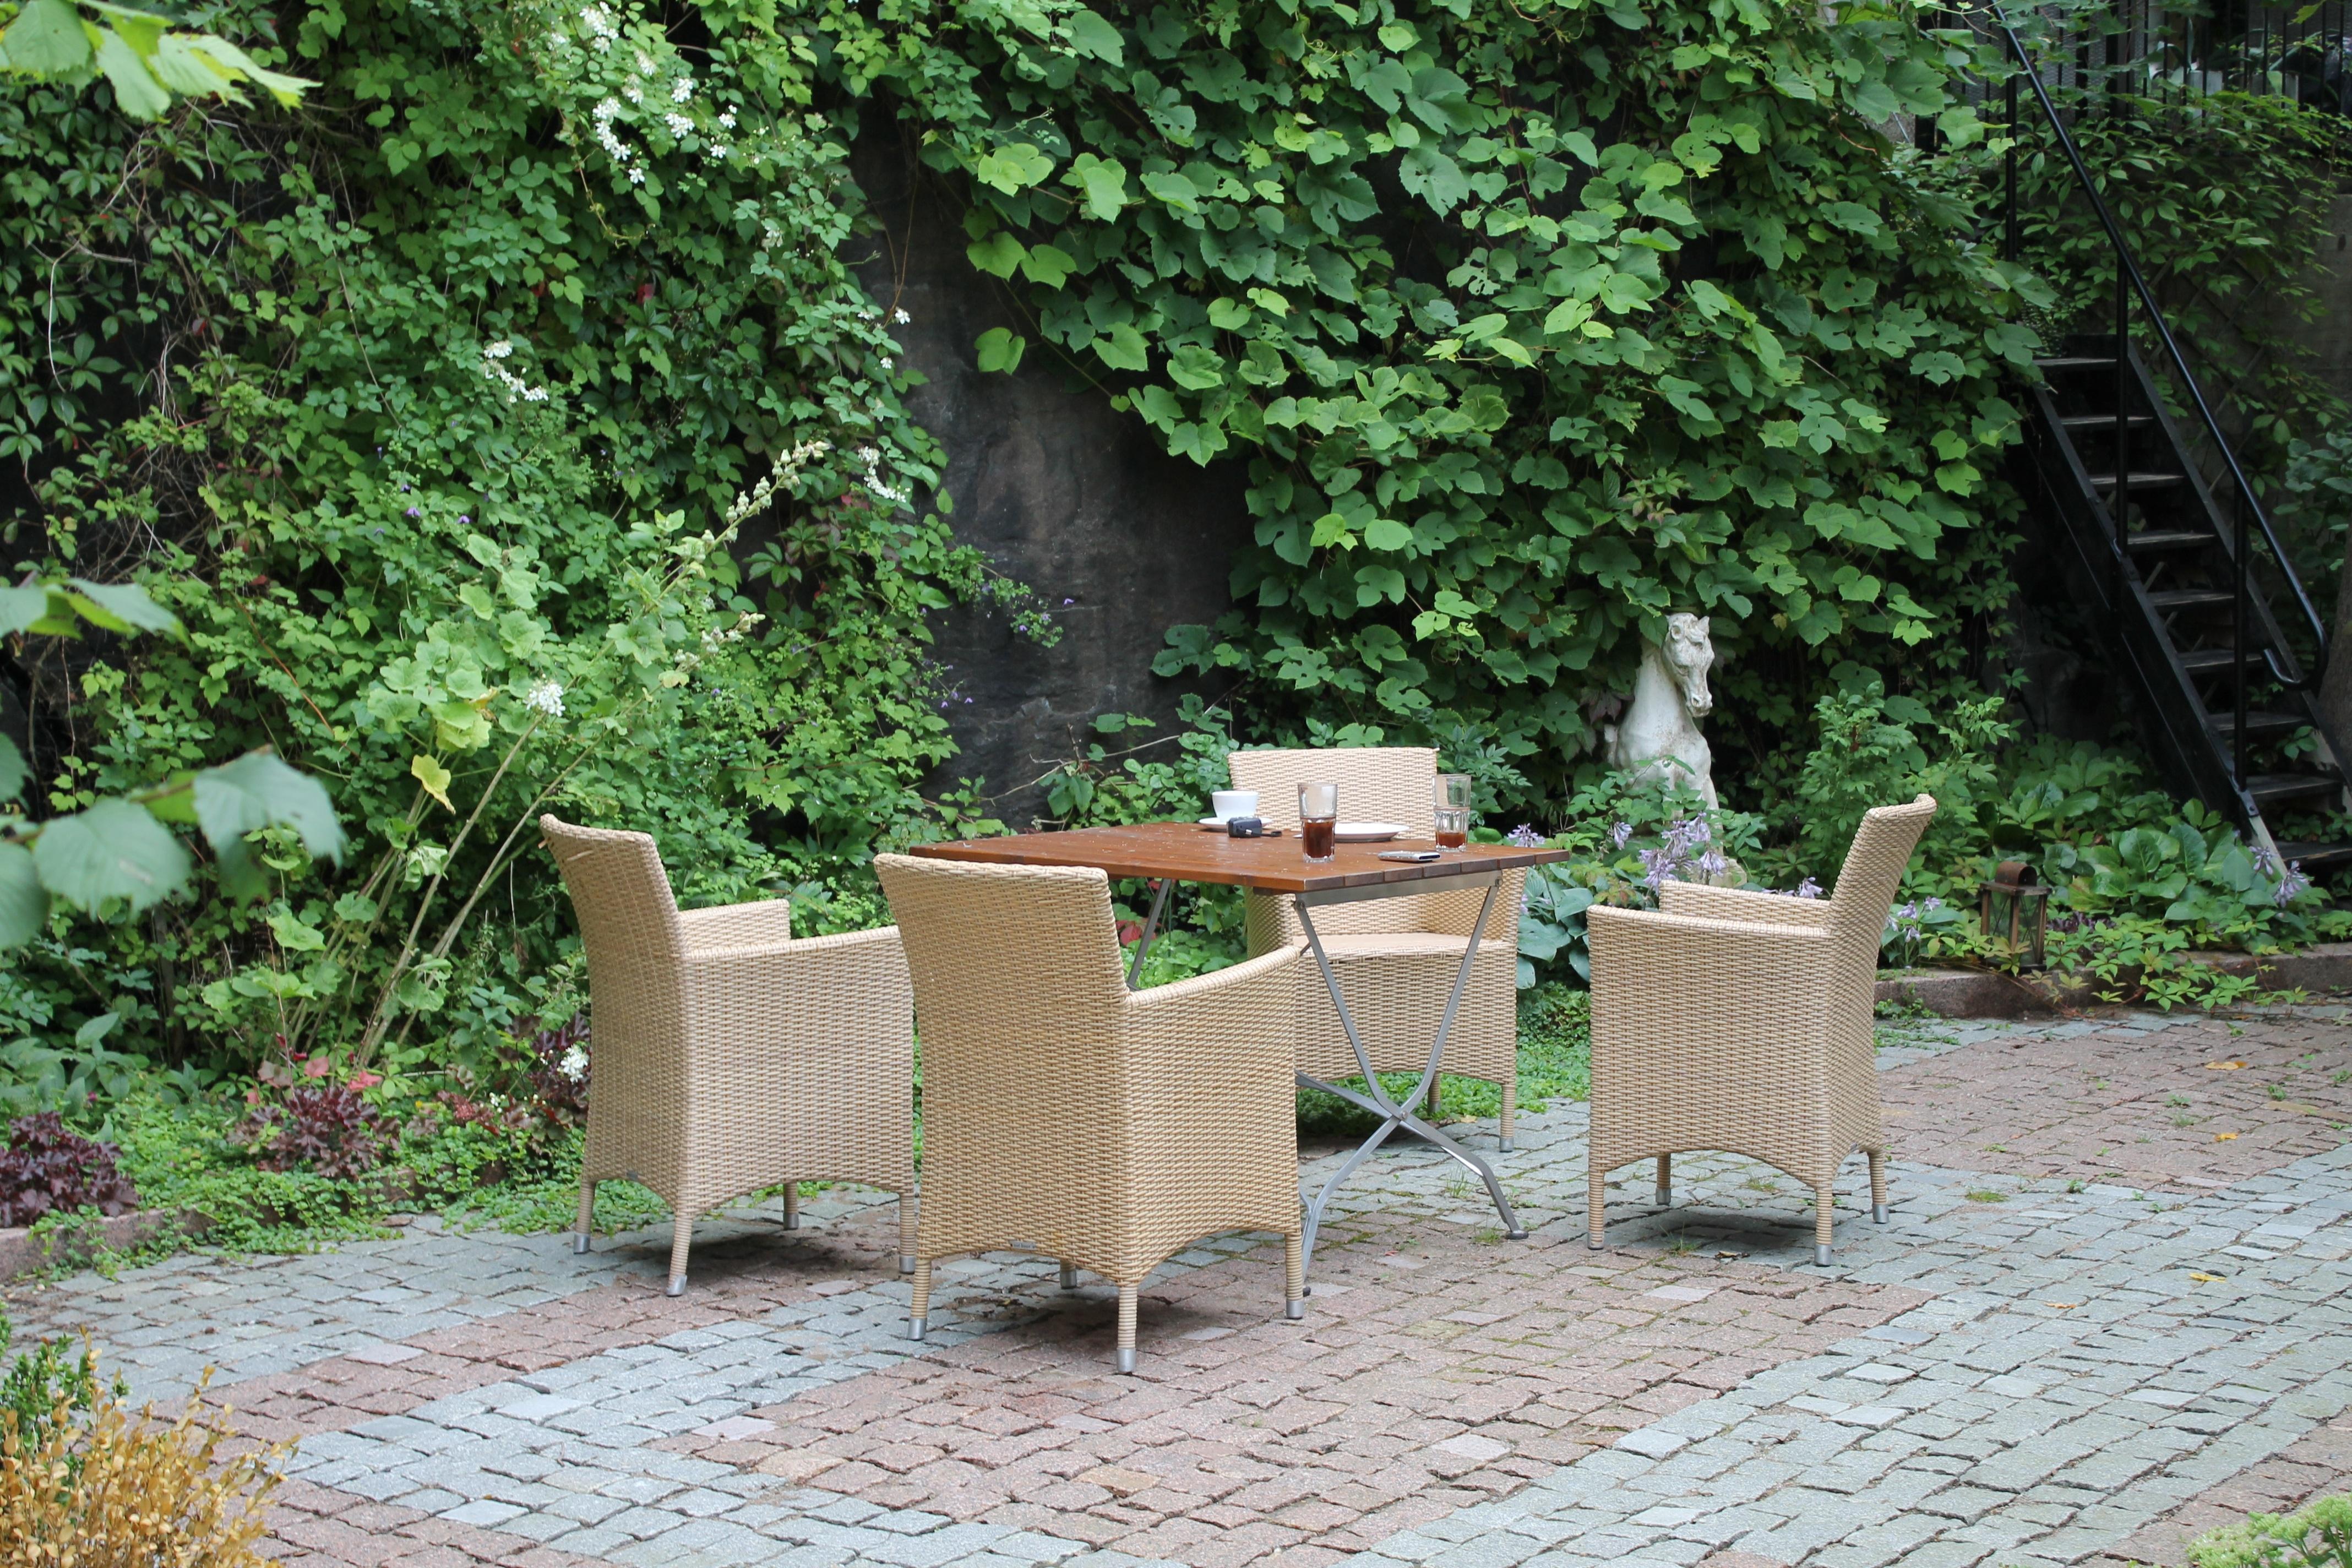 Fotos gratis : cafetería, café, césped, vendimia, flor, restaurante ...